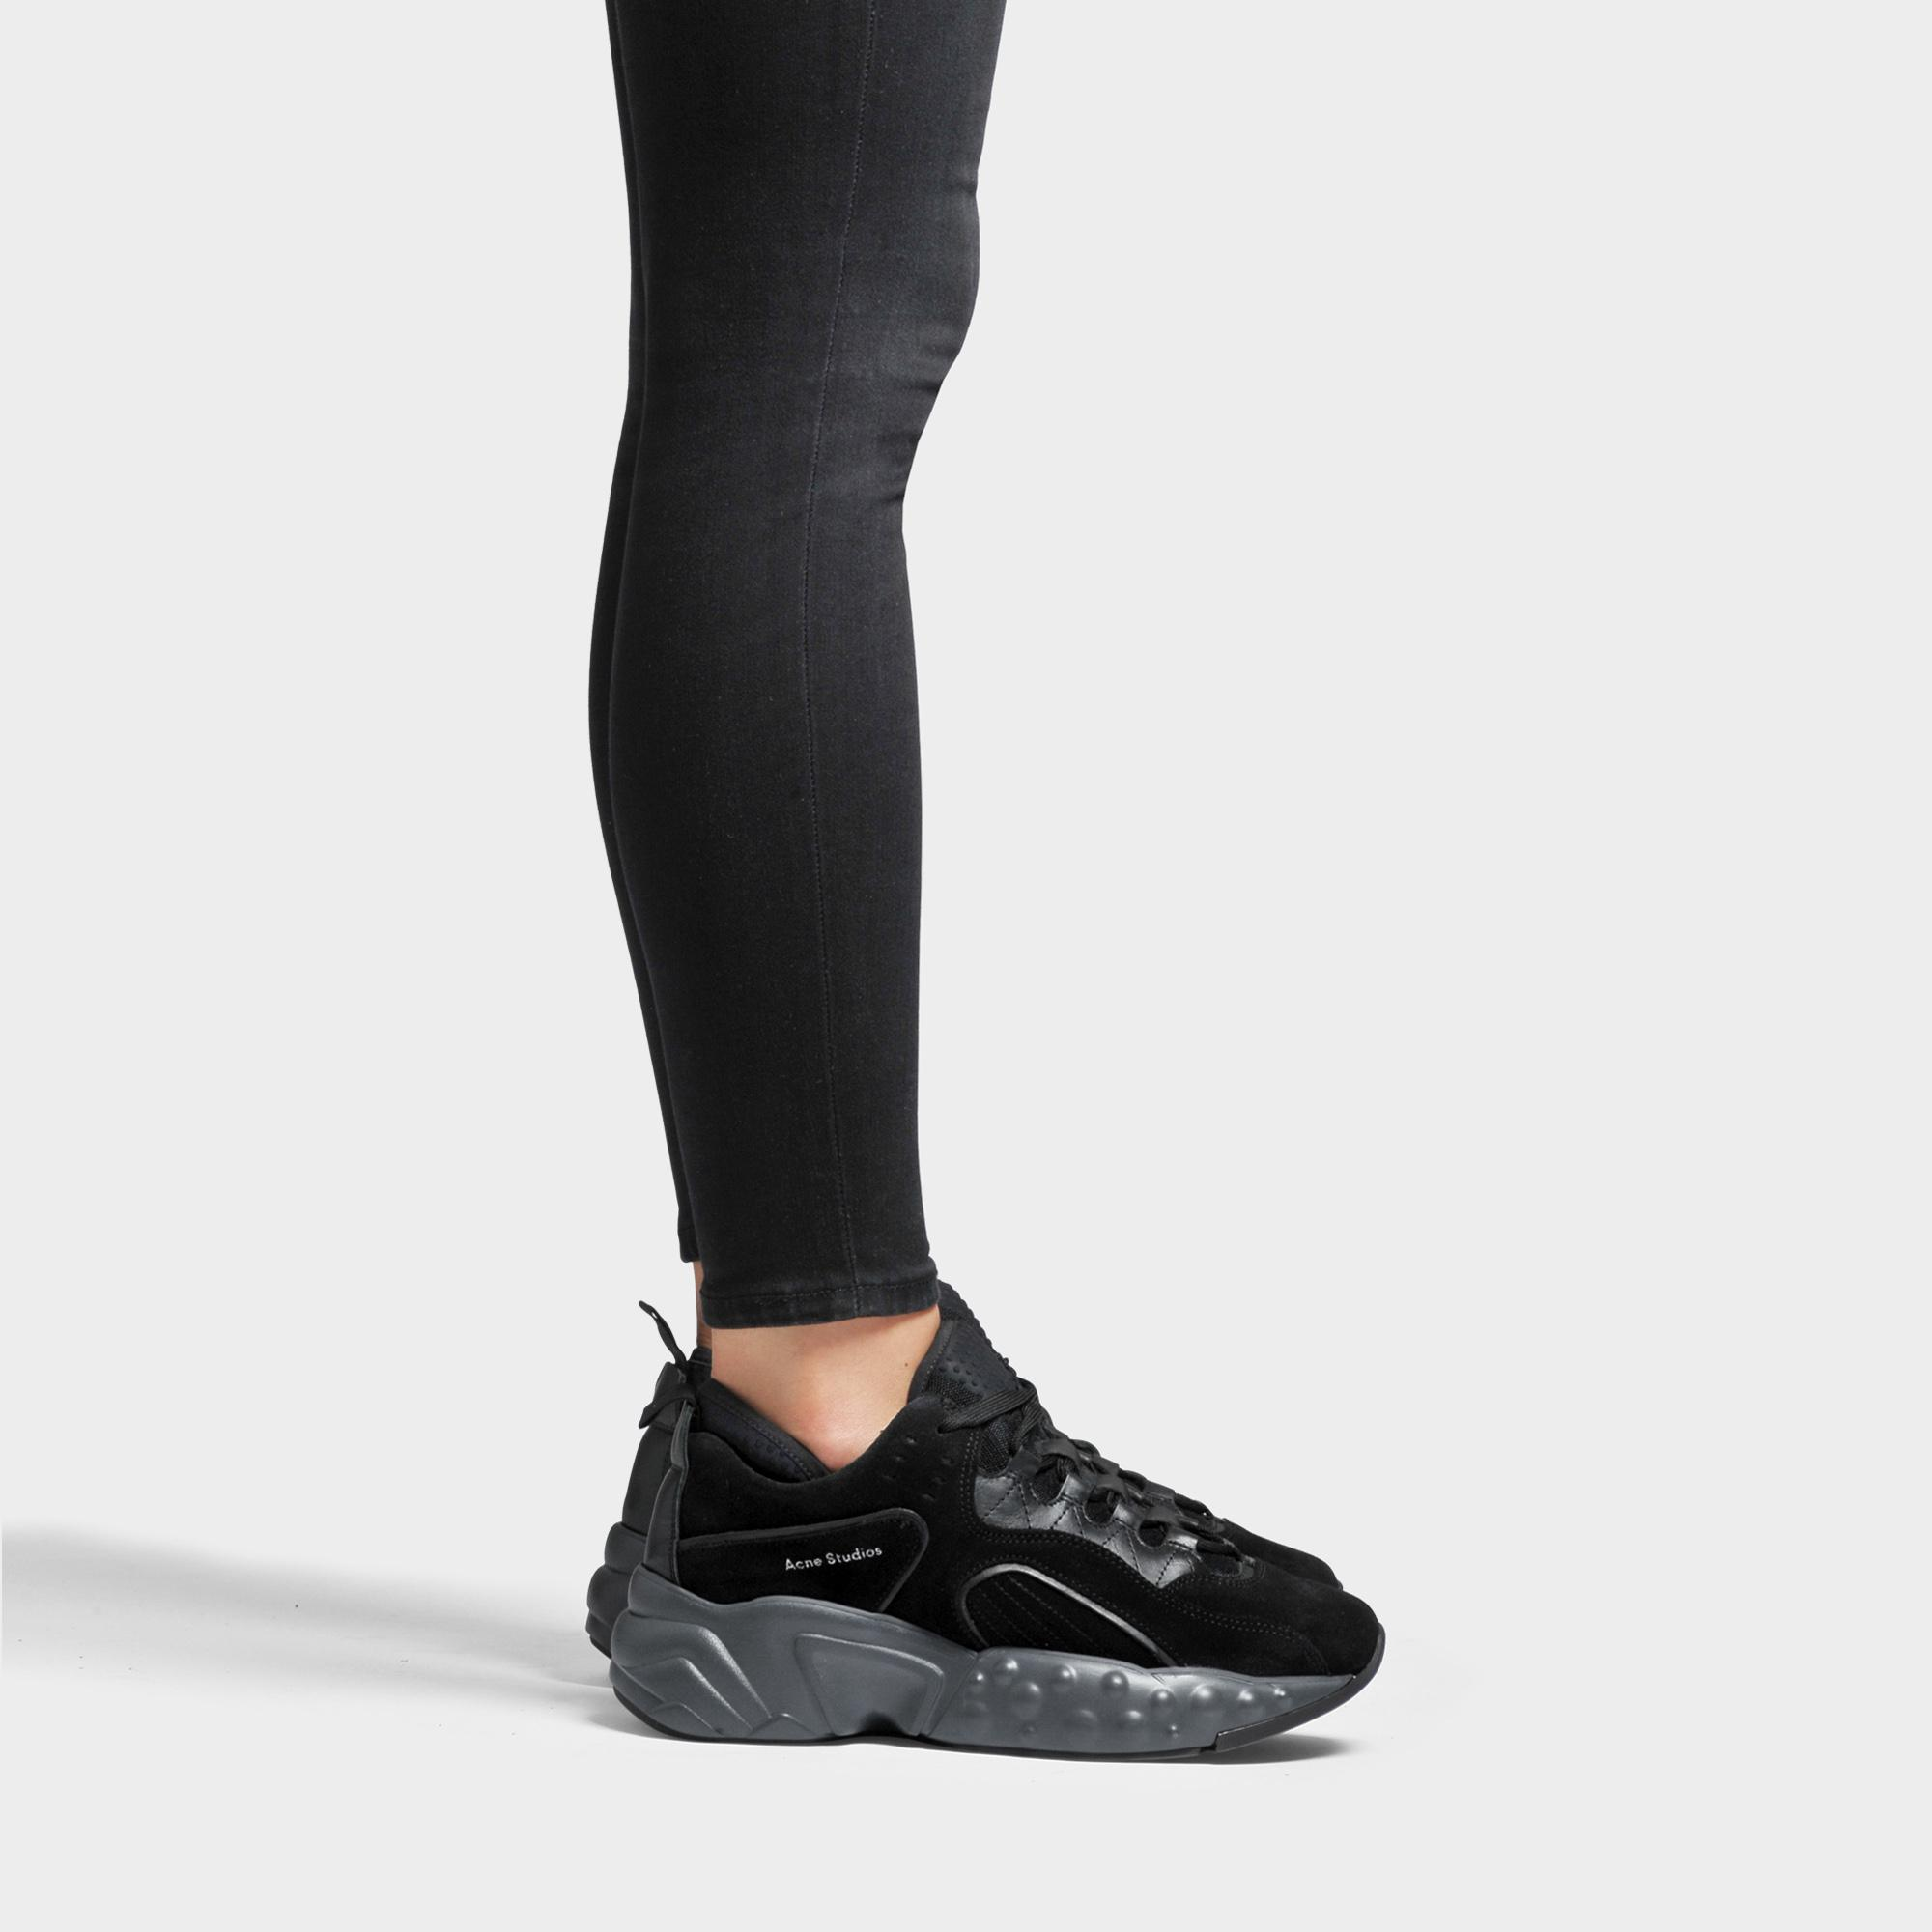 Acne Studios Suede Manhattan Sneakers